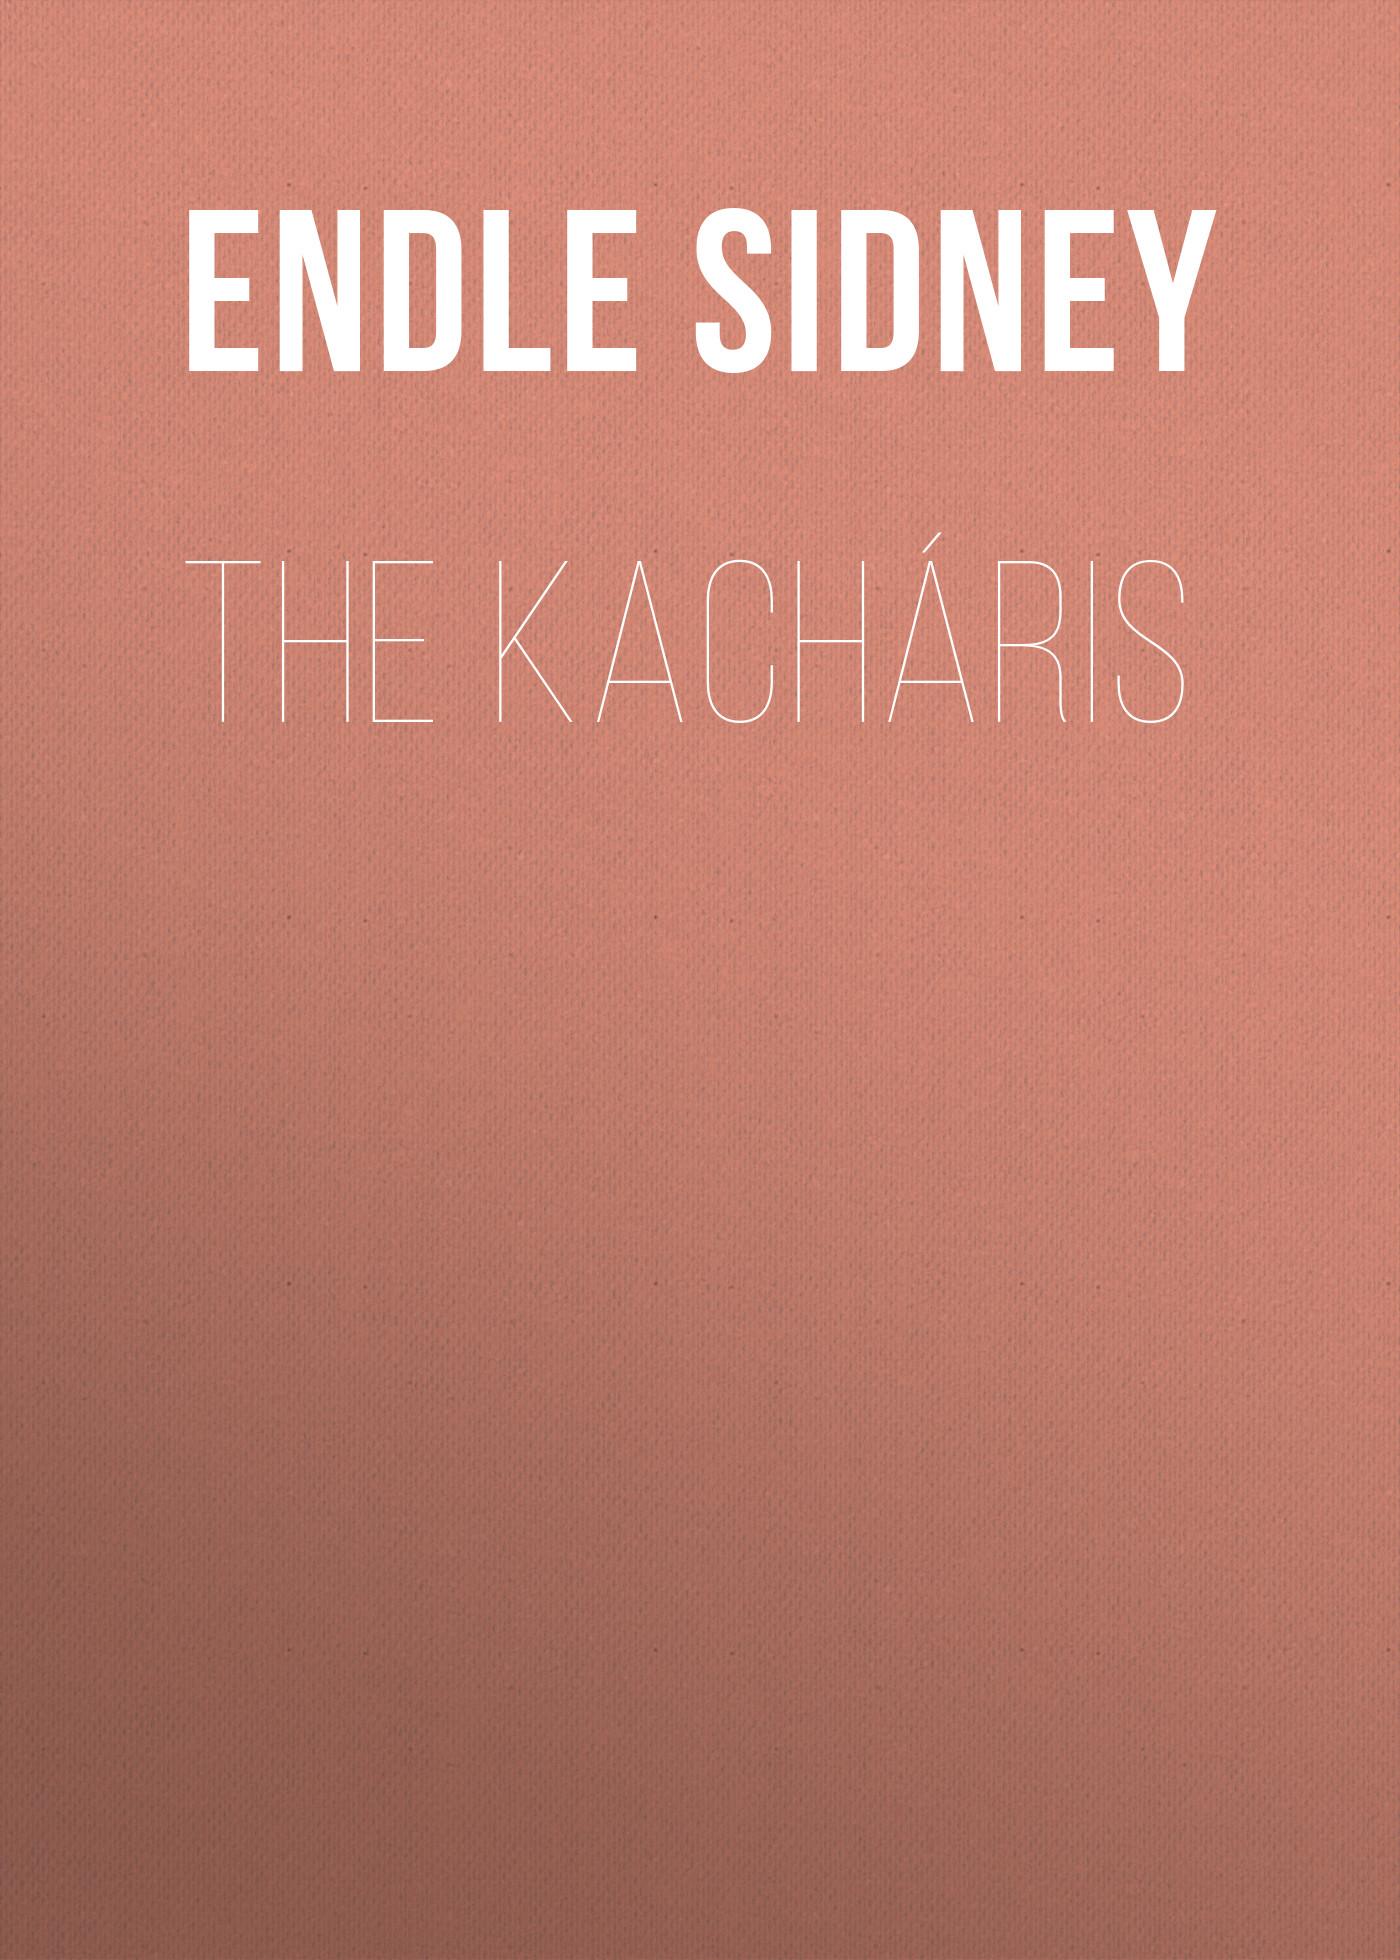 Endle Sidney The Kacháris sidney sheldon the doomsday conspiracy